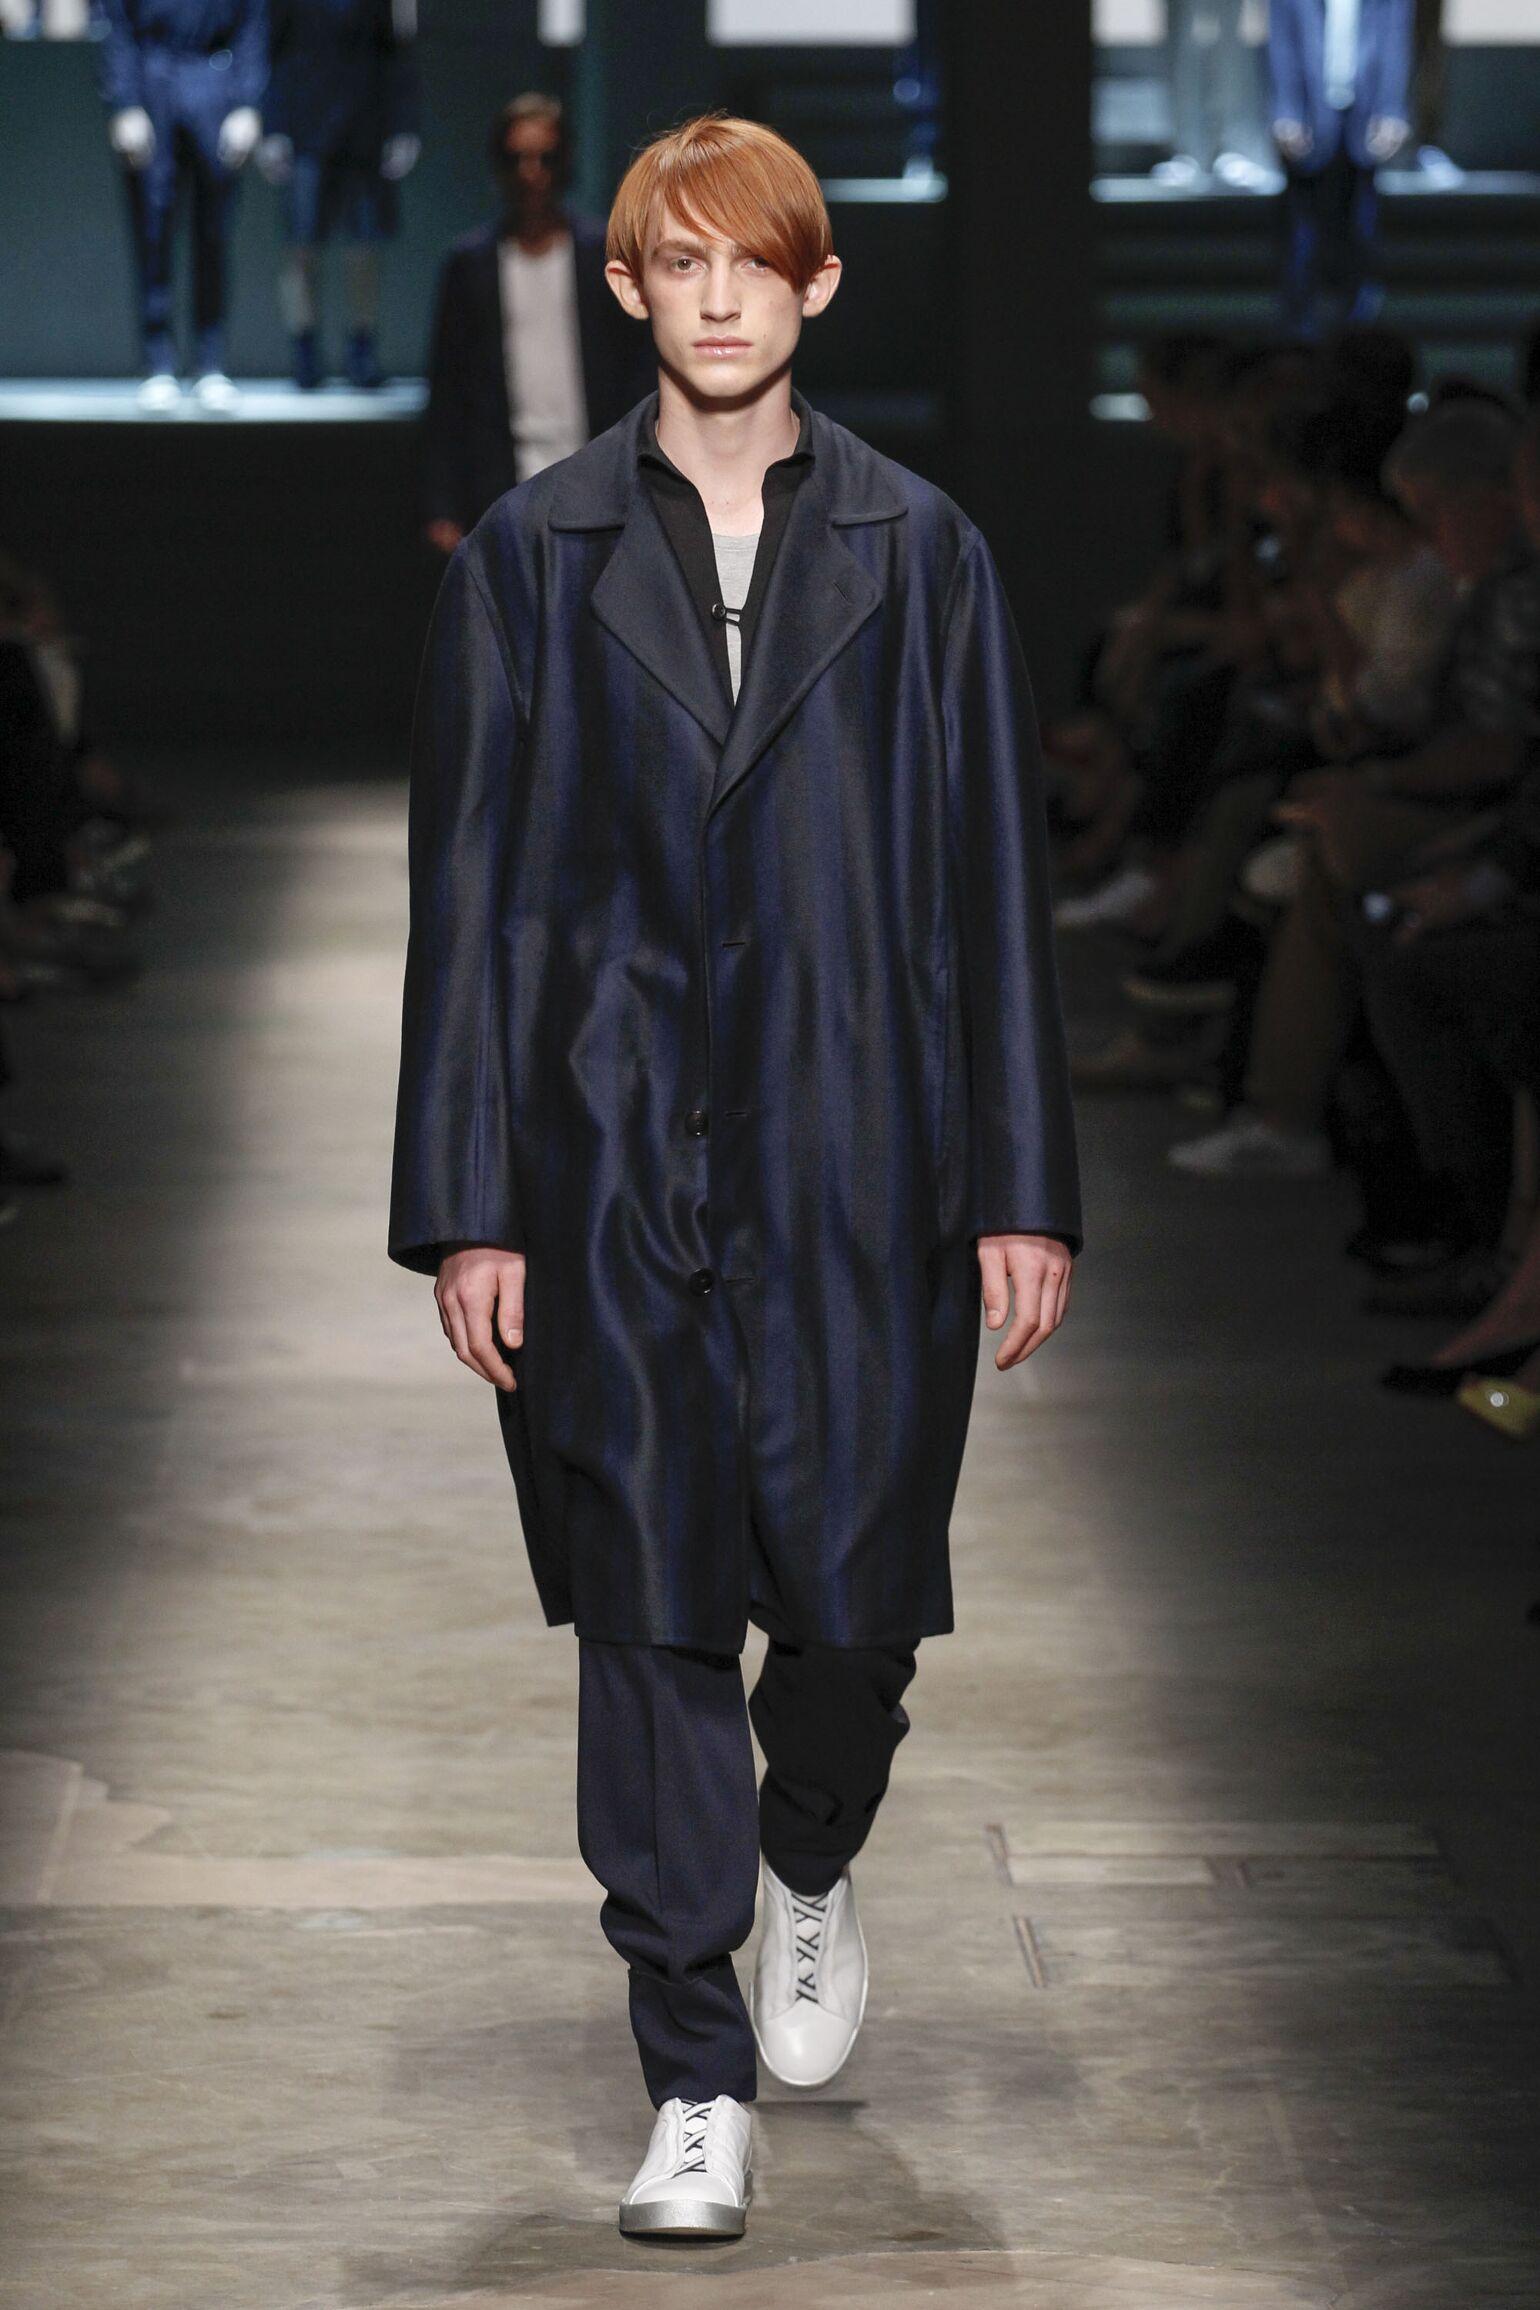 Summer 2015 Fashion Trends Ermenegildo Zegna Couture